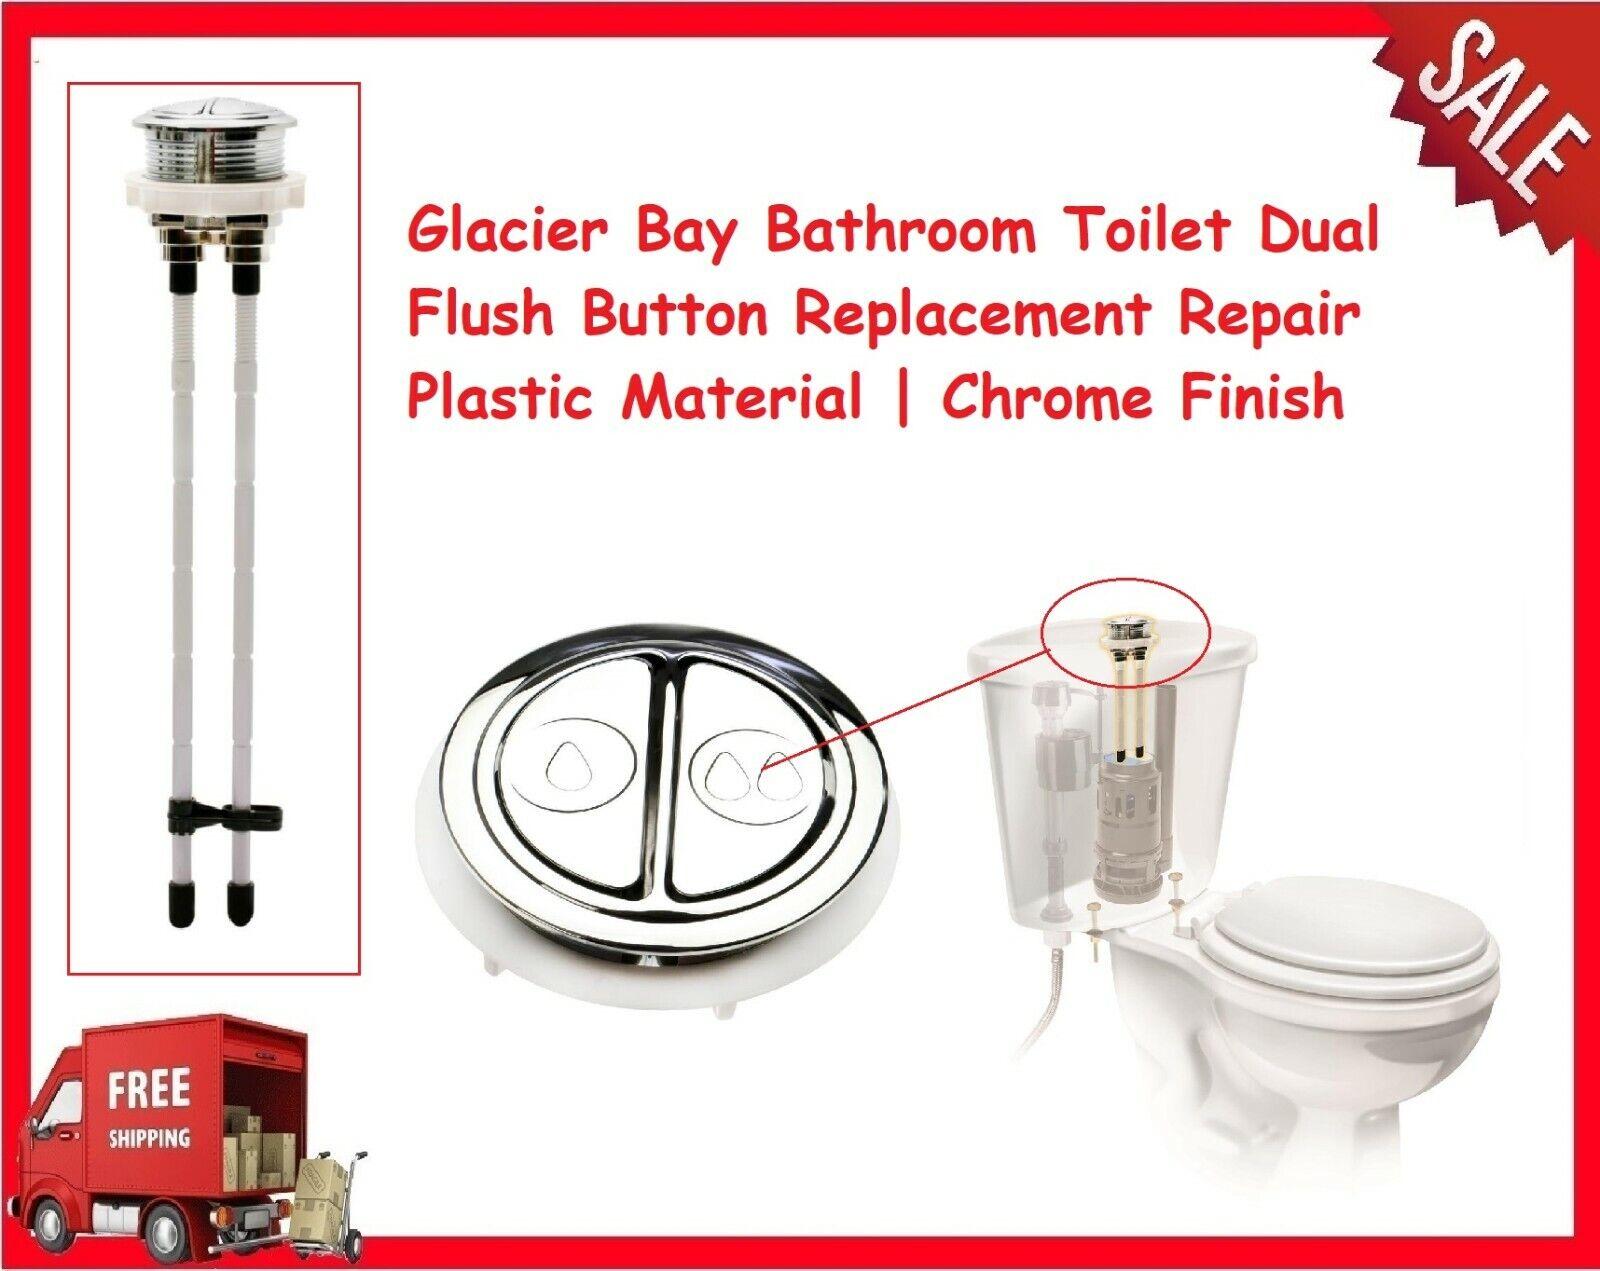 Glacier Bay Bathroom Toilet Dual Flush On Replacement Repair Plastic Chrome For Online Ebay